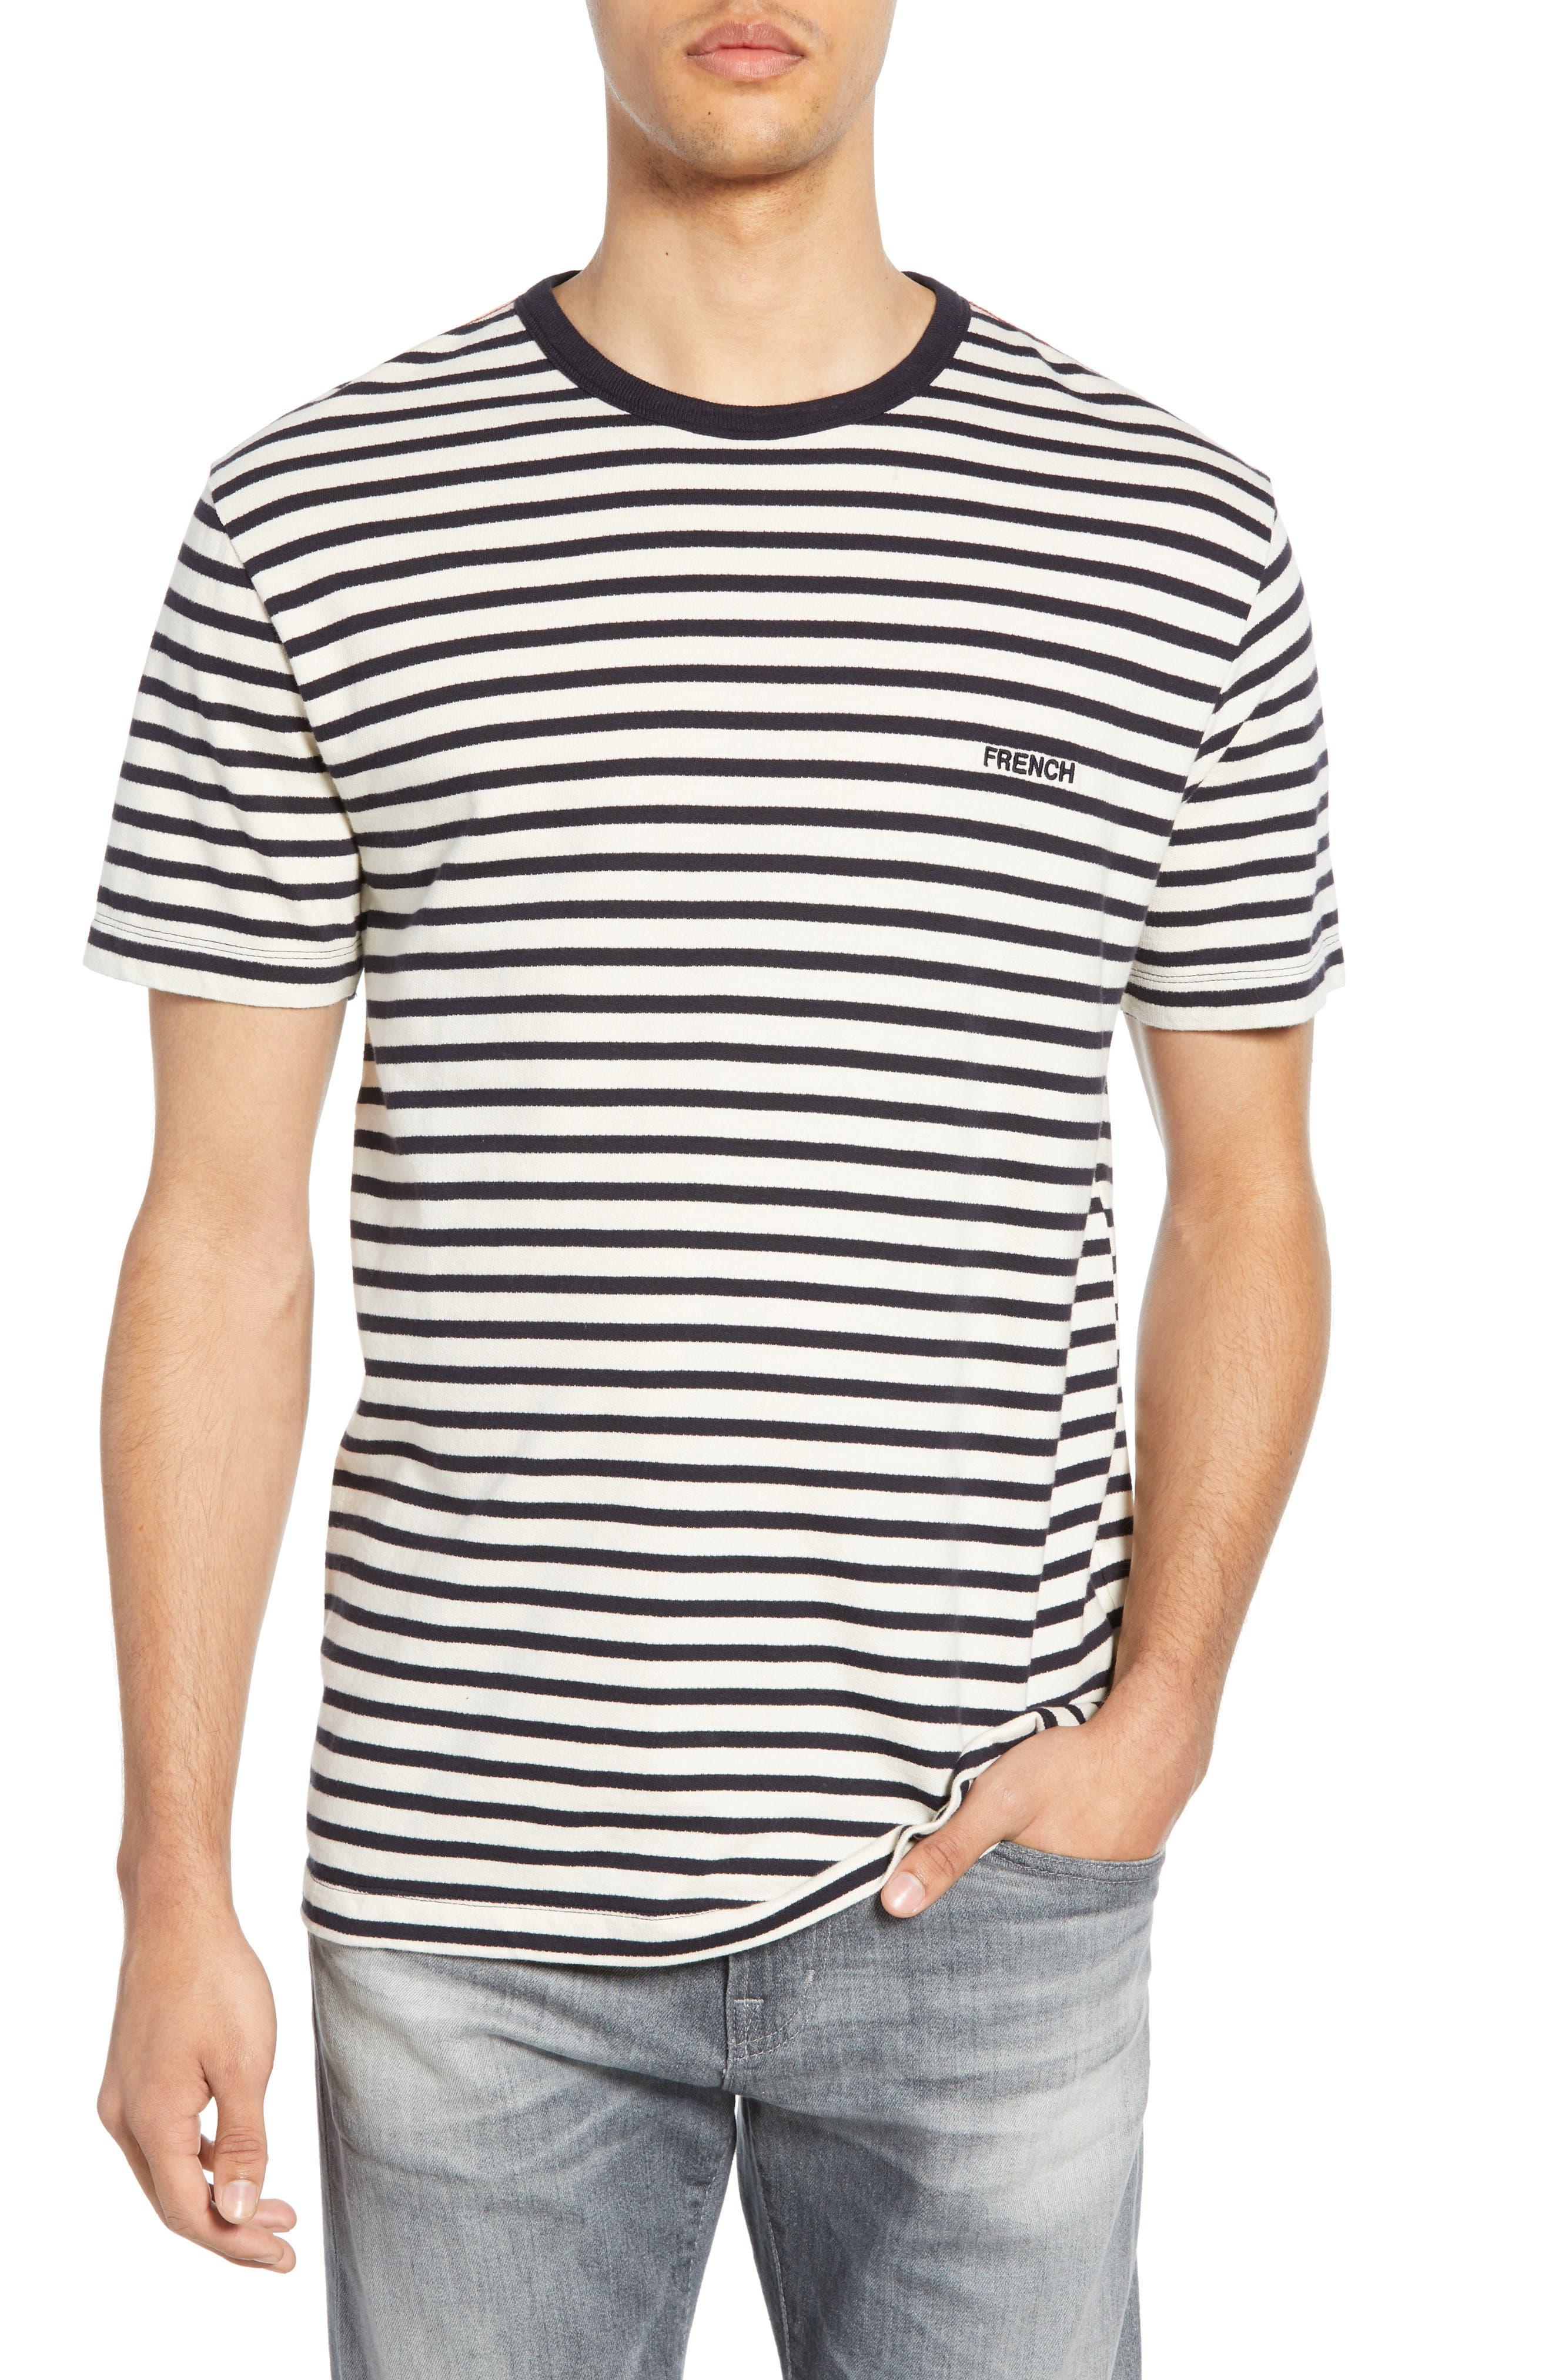 French Connection Breton Stripe Ringer Neck T-Shirt, Blue